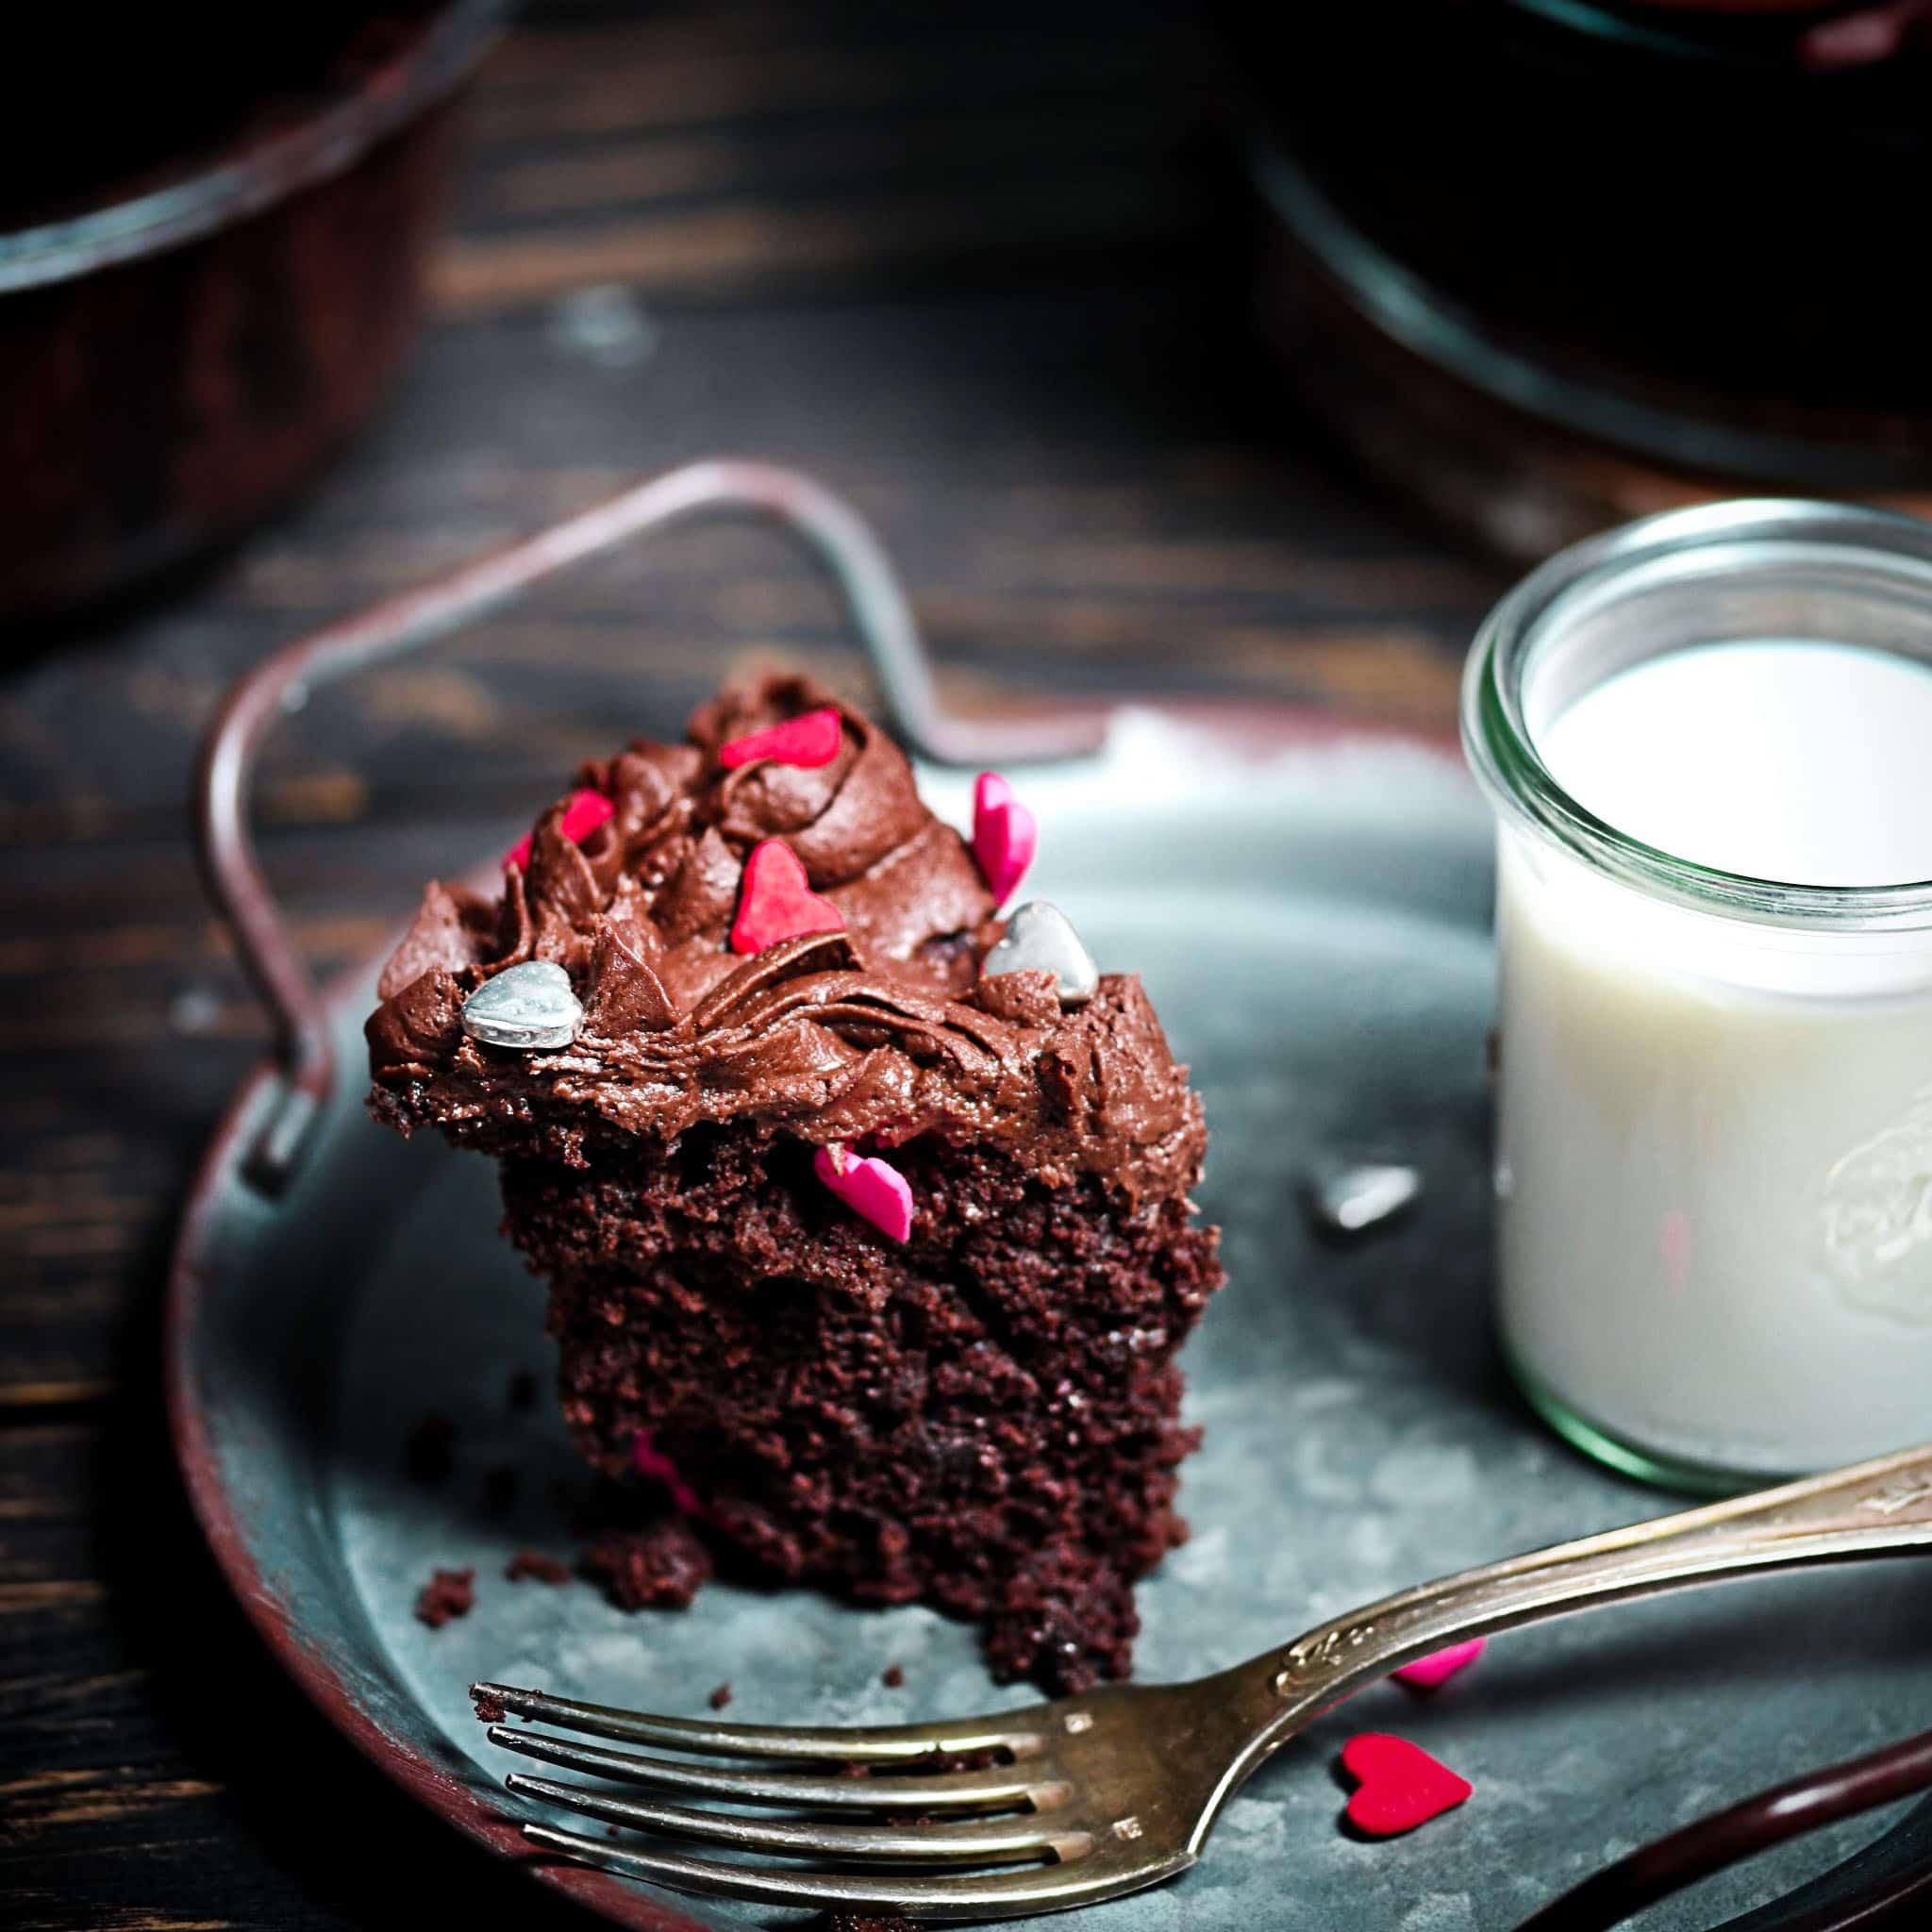 Grain-Free Microwave Cake With Sprinkles